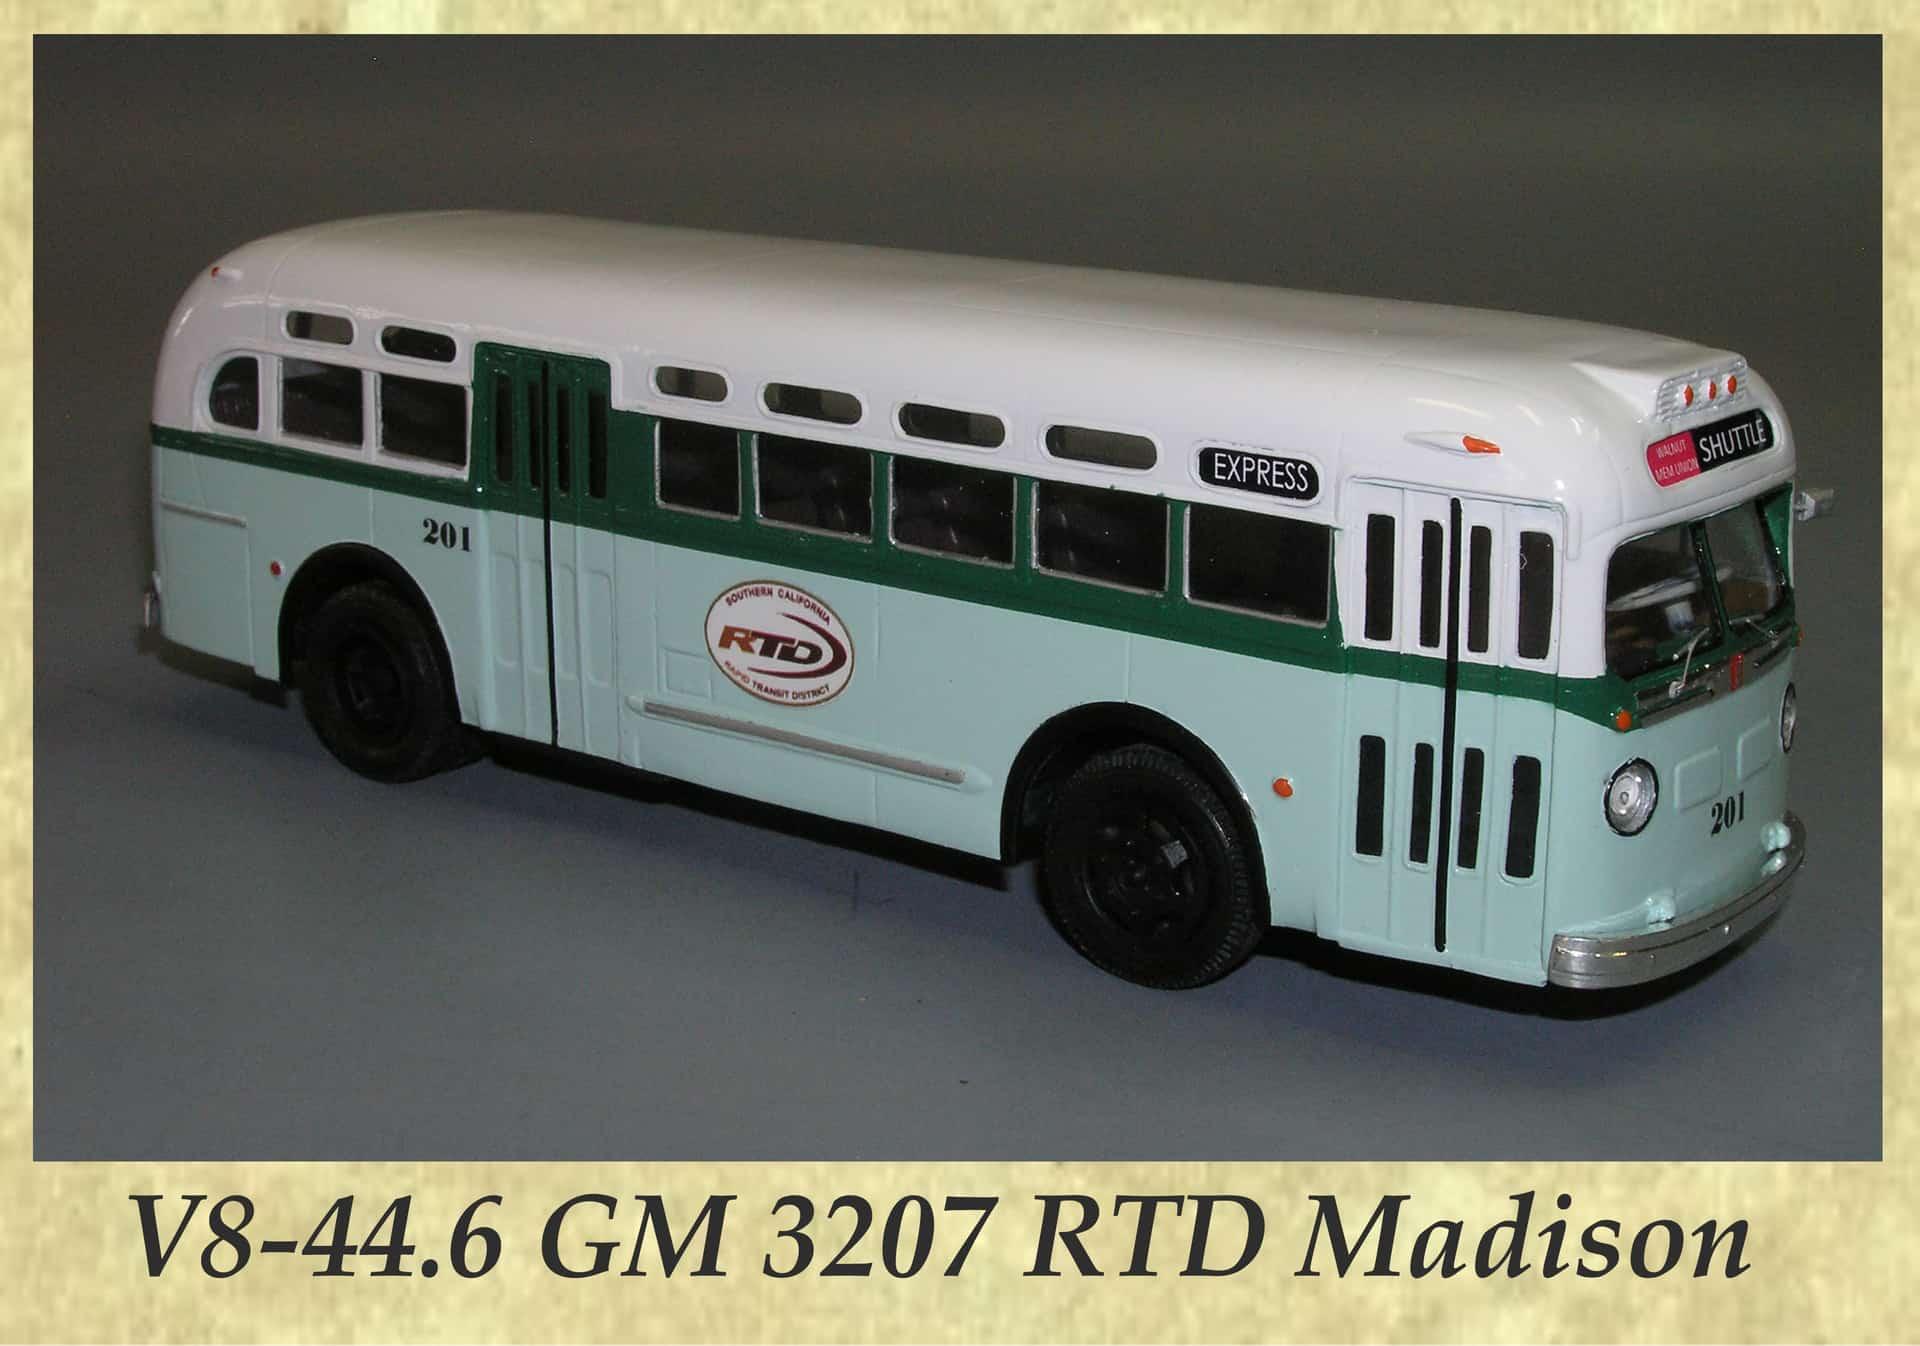 V8-44.6 GM 3207 RTD Madison